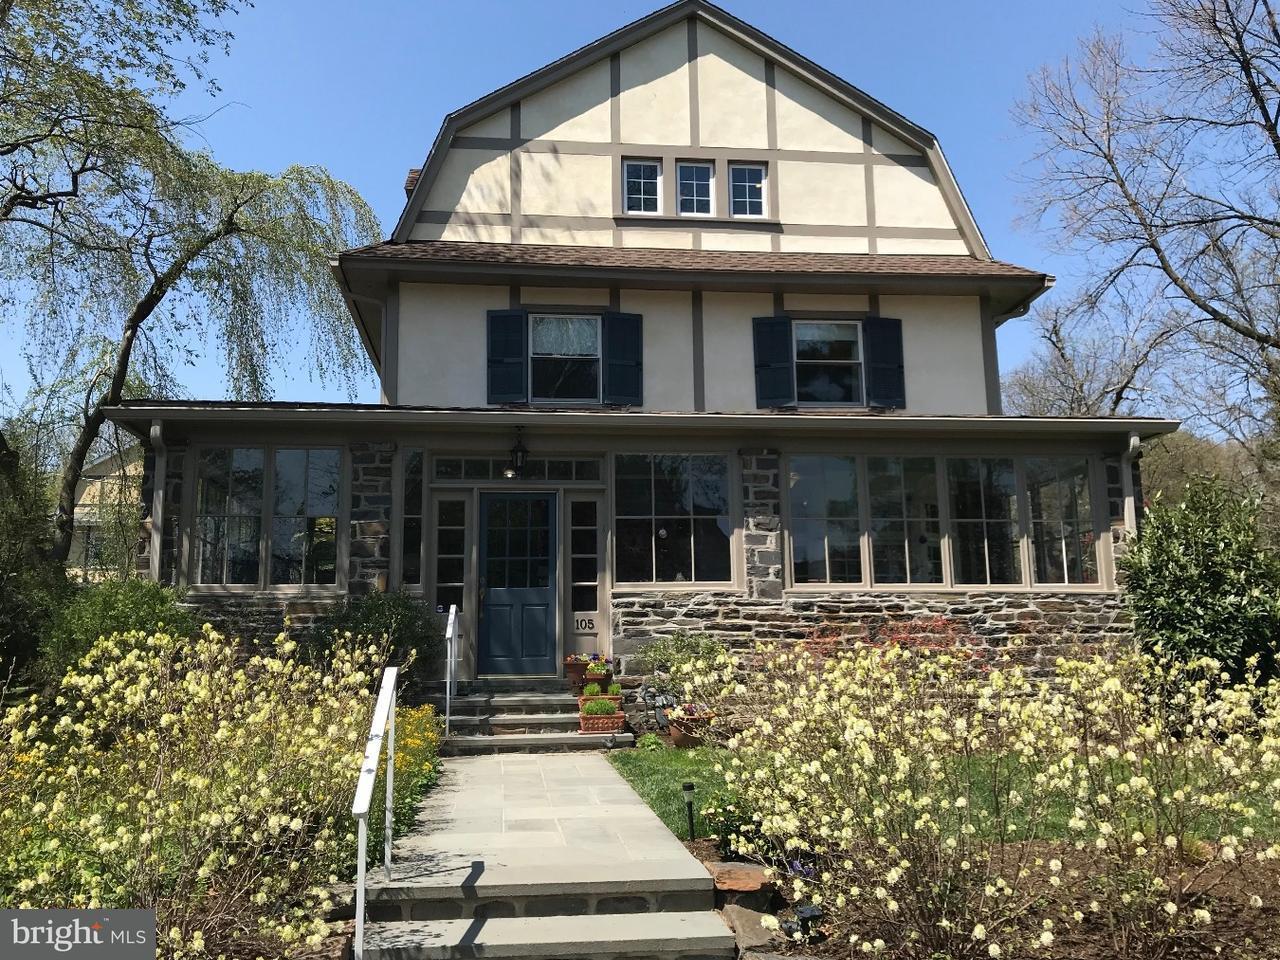 105 Lodges Lane Bala Cynwyd, PA 19004